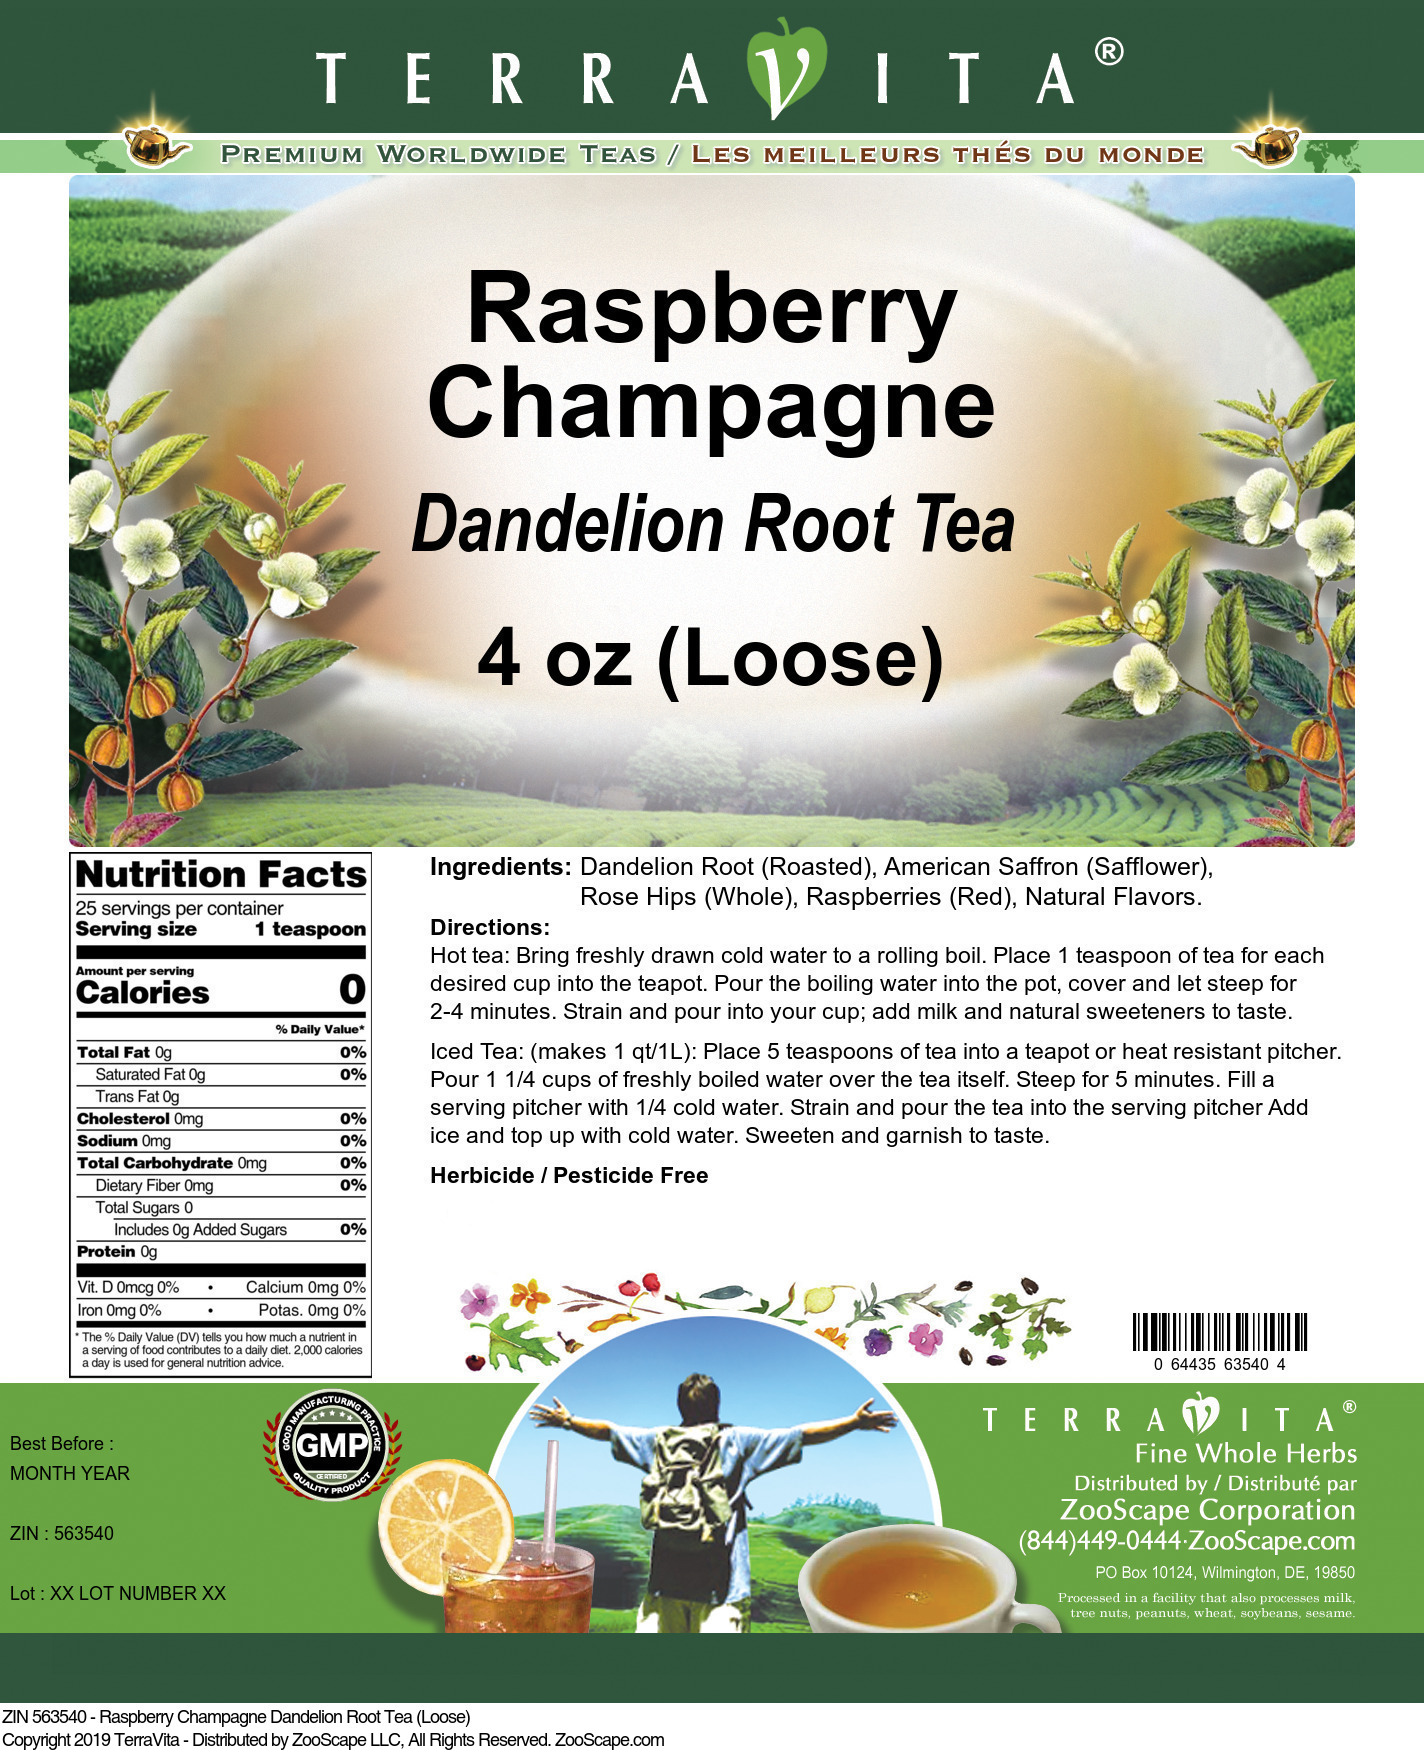 Raspberry Champagne Dandelion Root